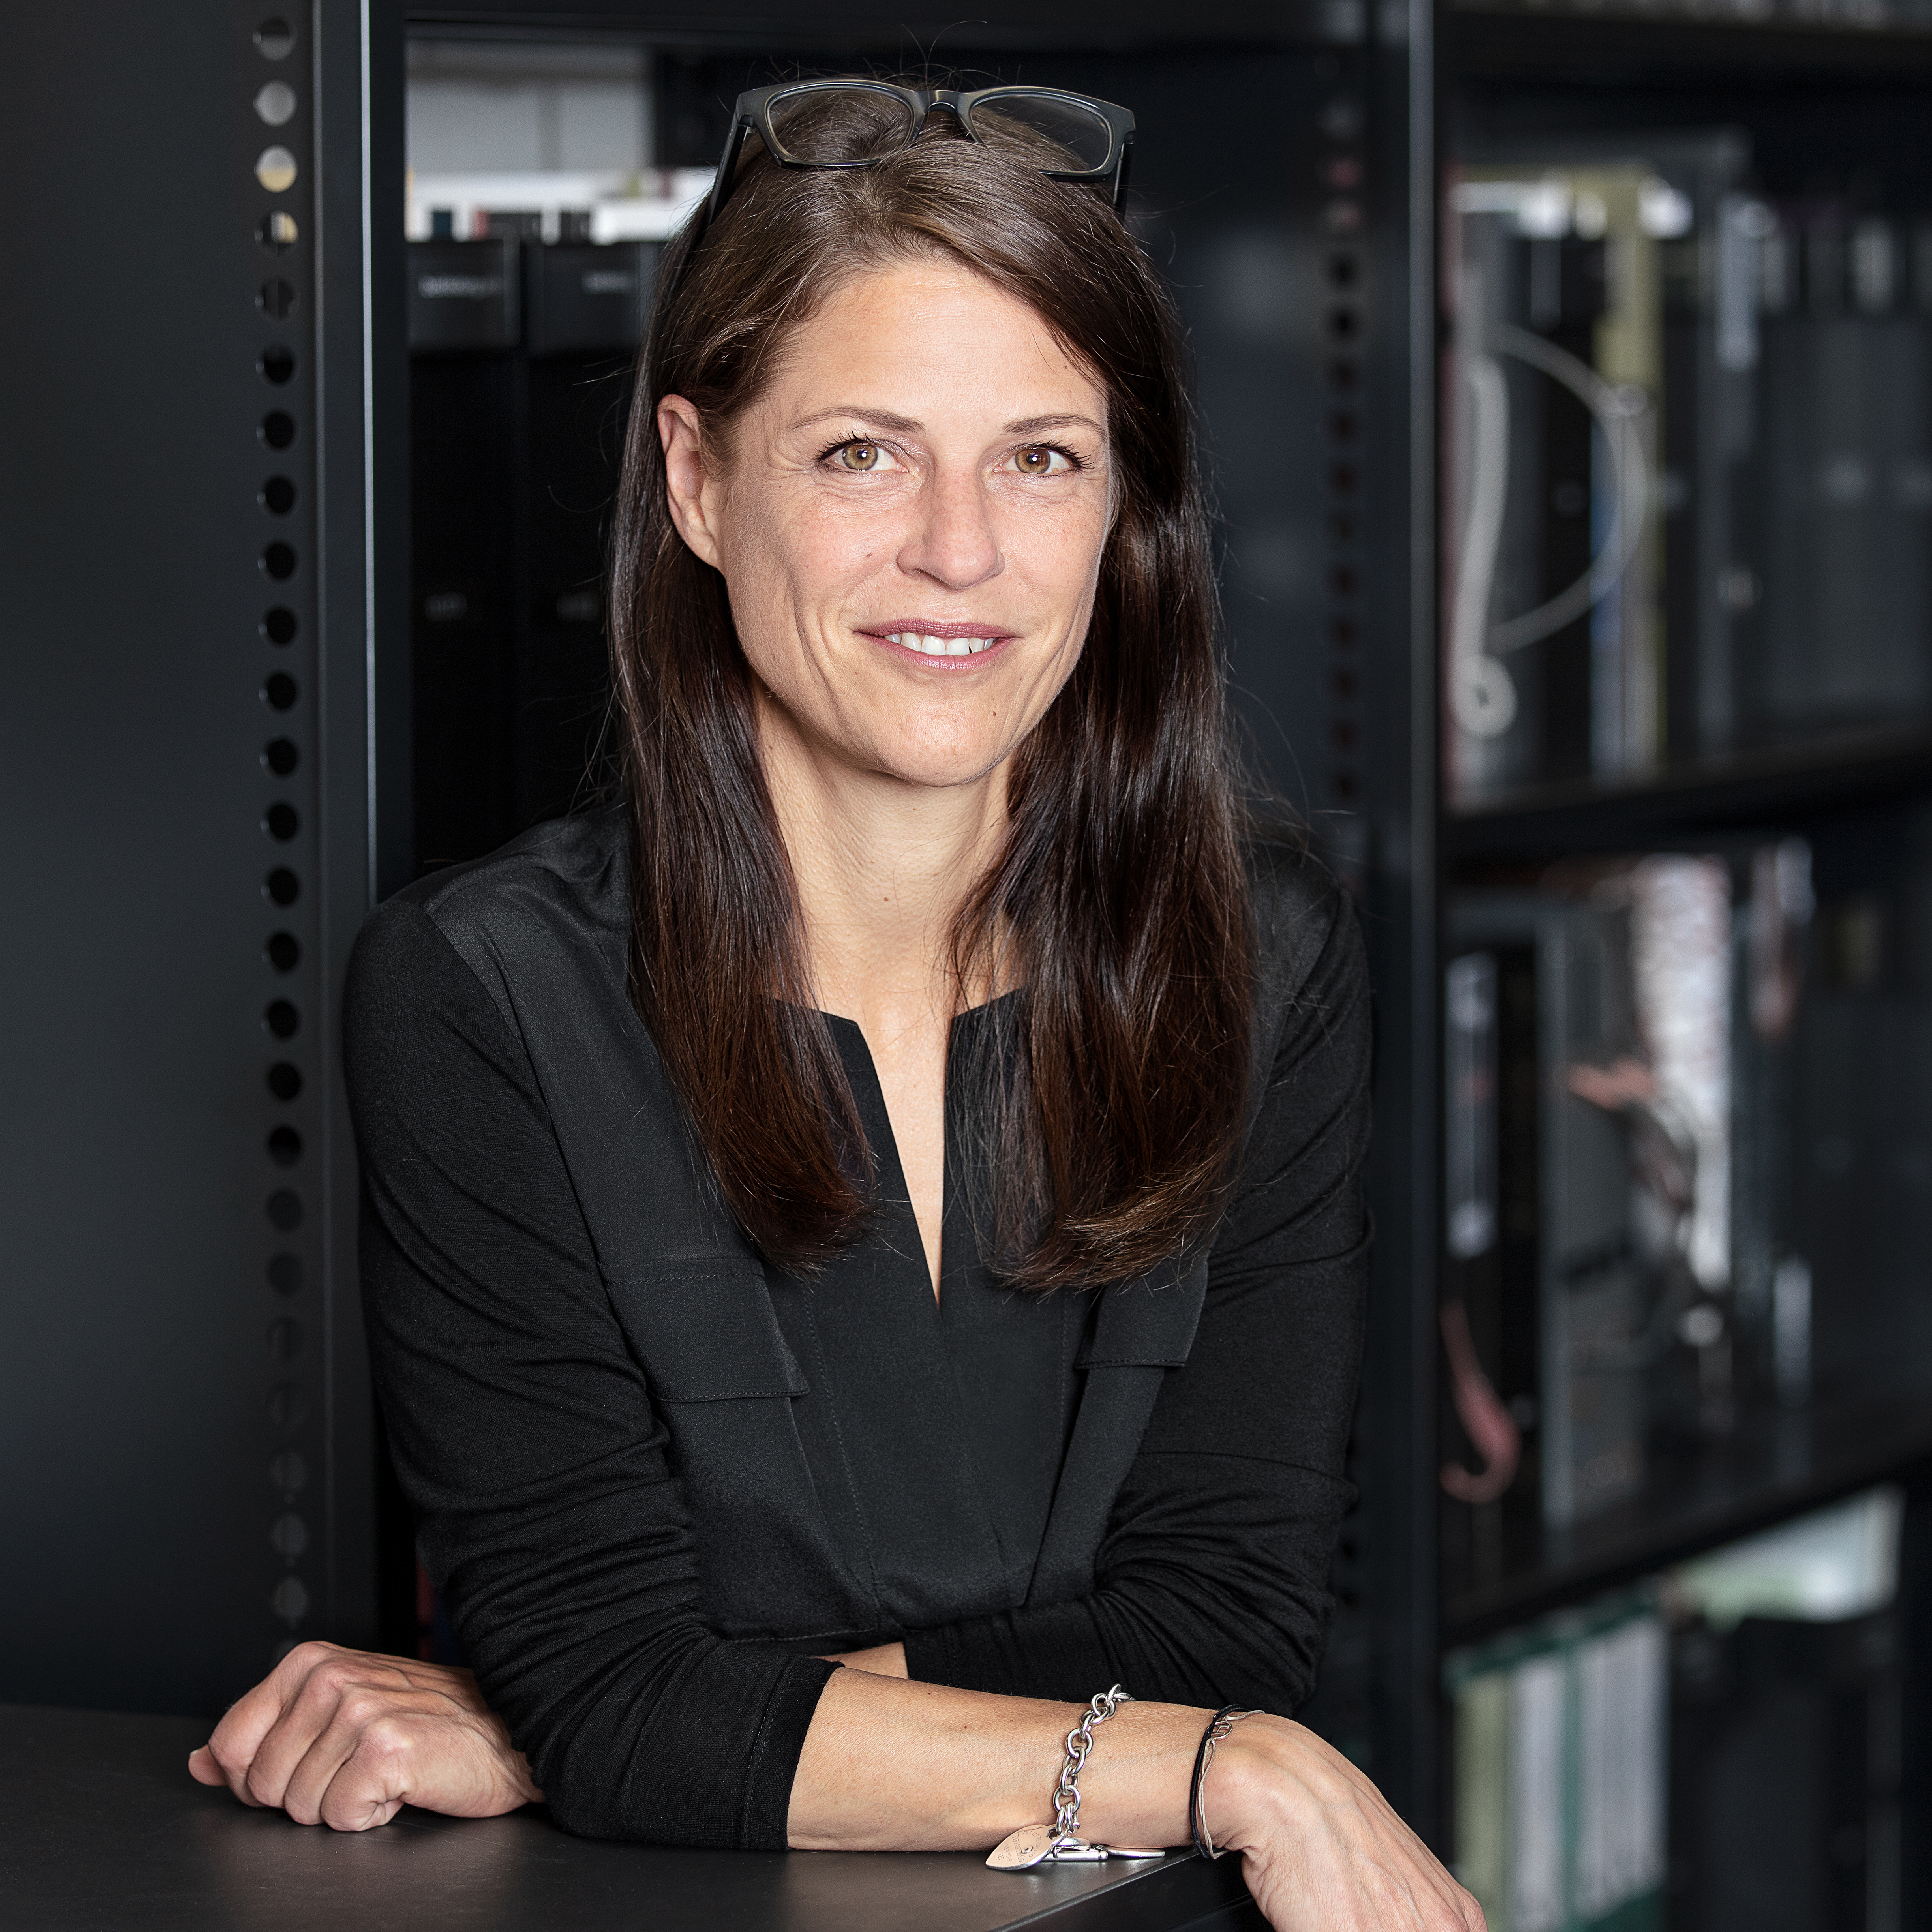 Eve Baumann